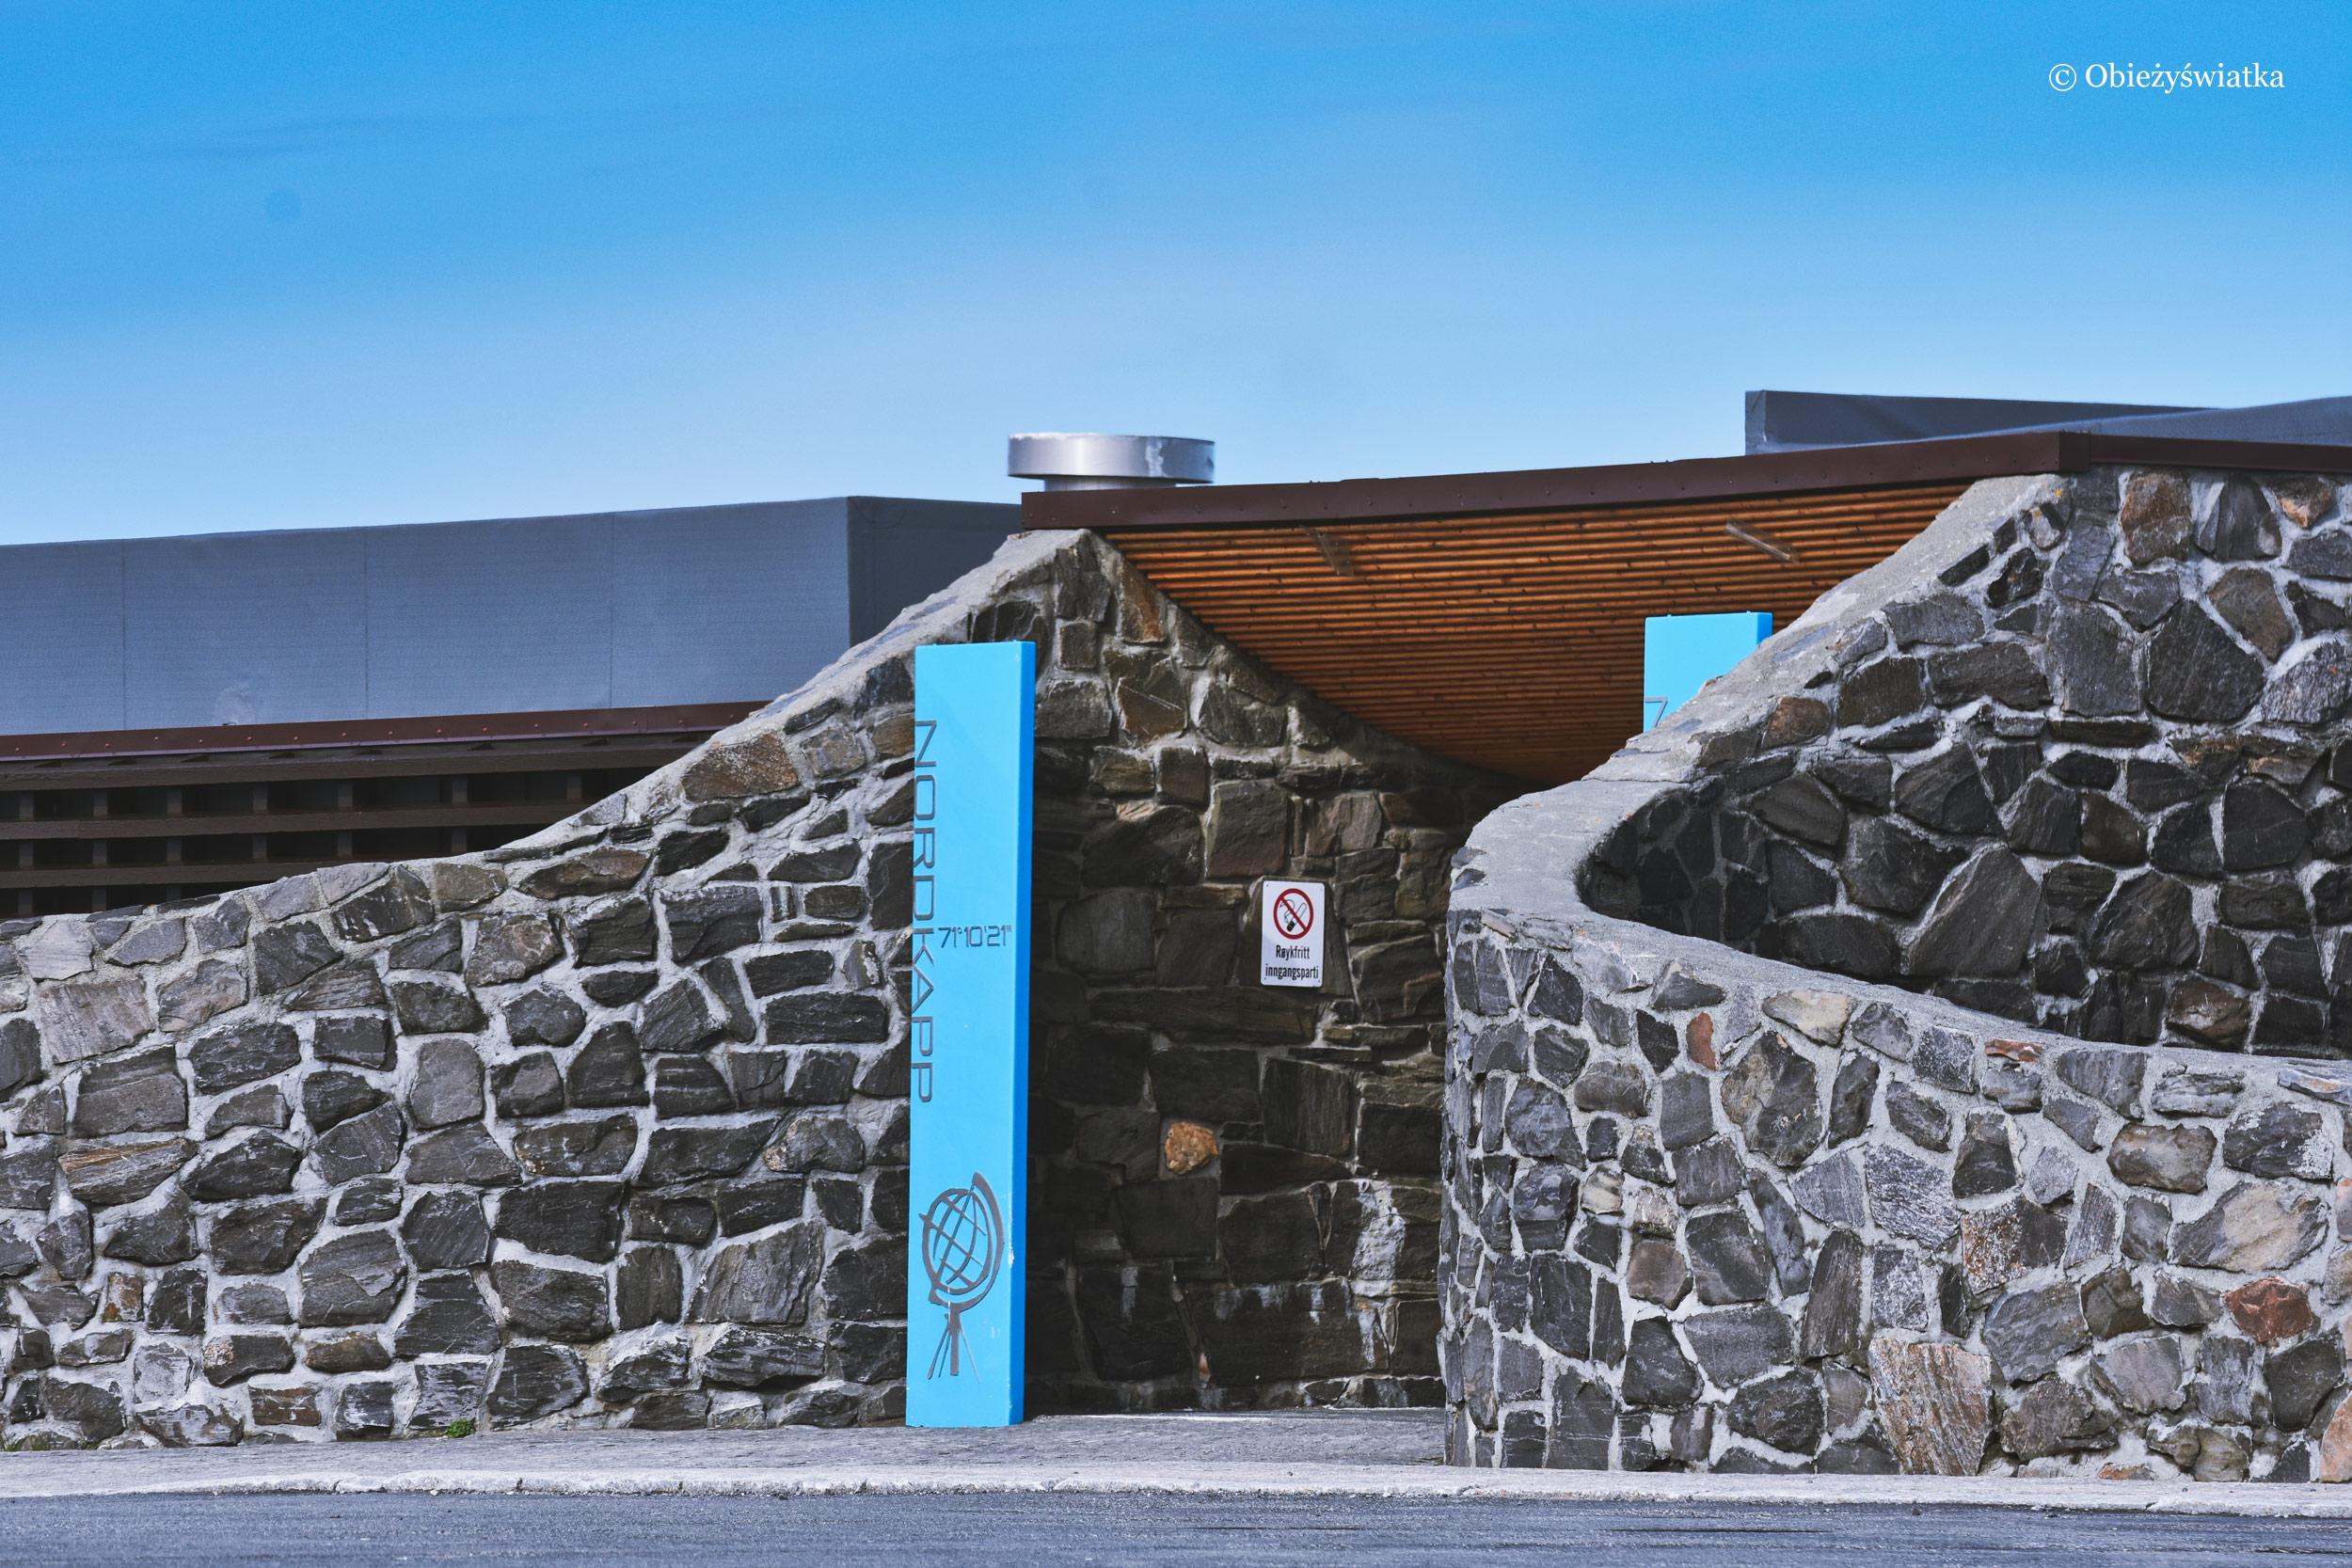 Hala - Nordkapp - Przylądek Północny, Norwegia